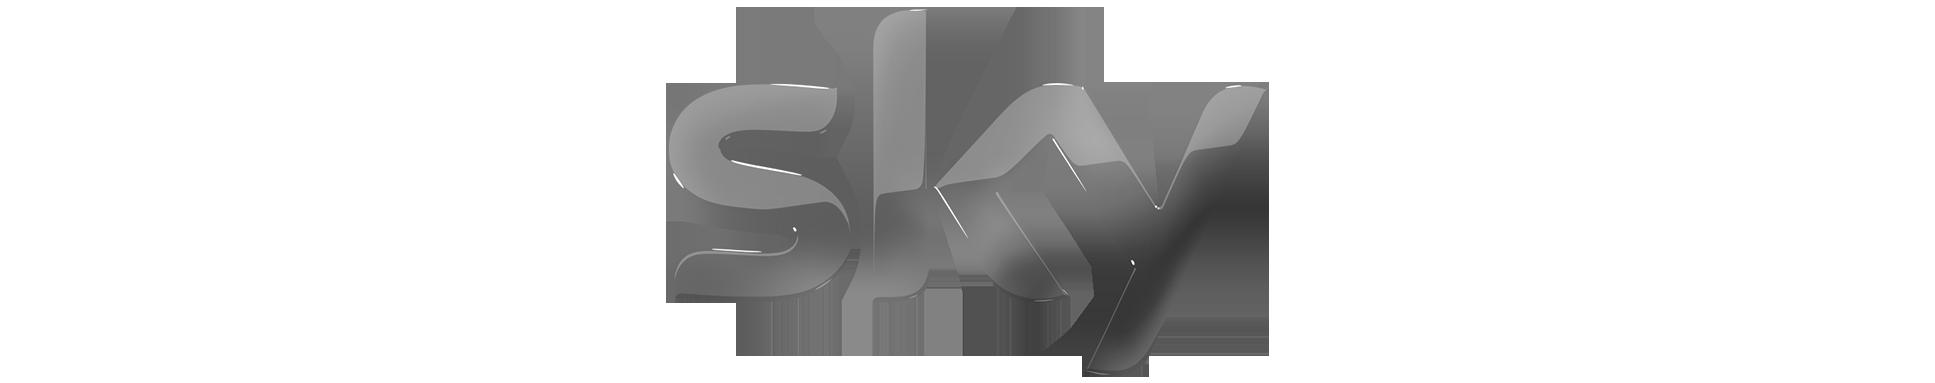 sky-bw